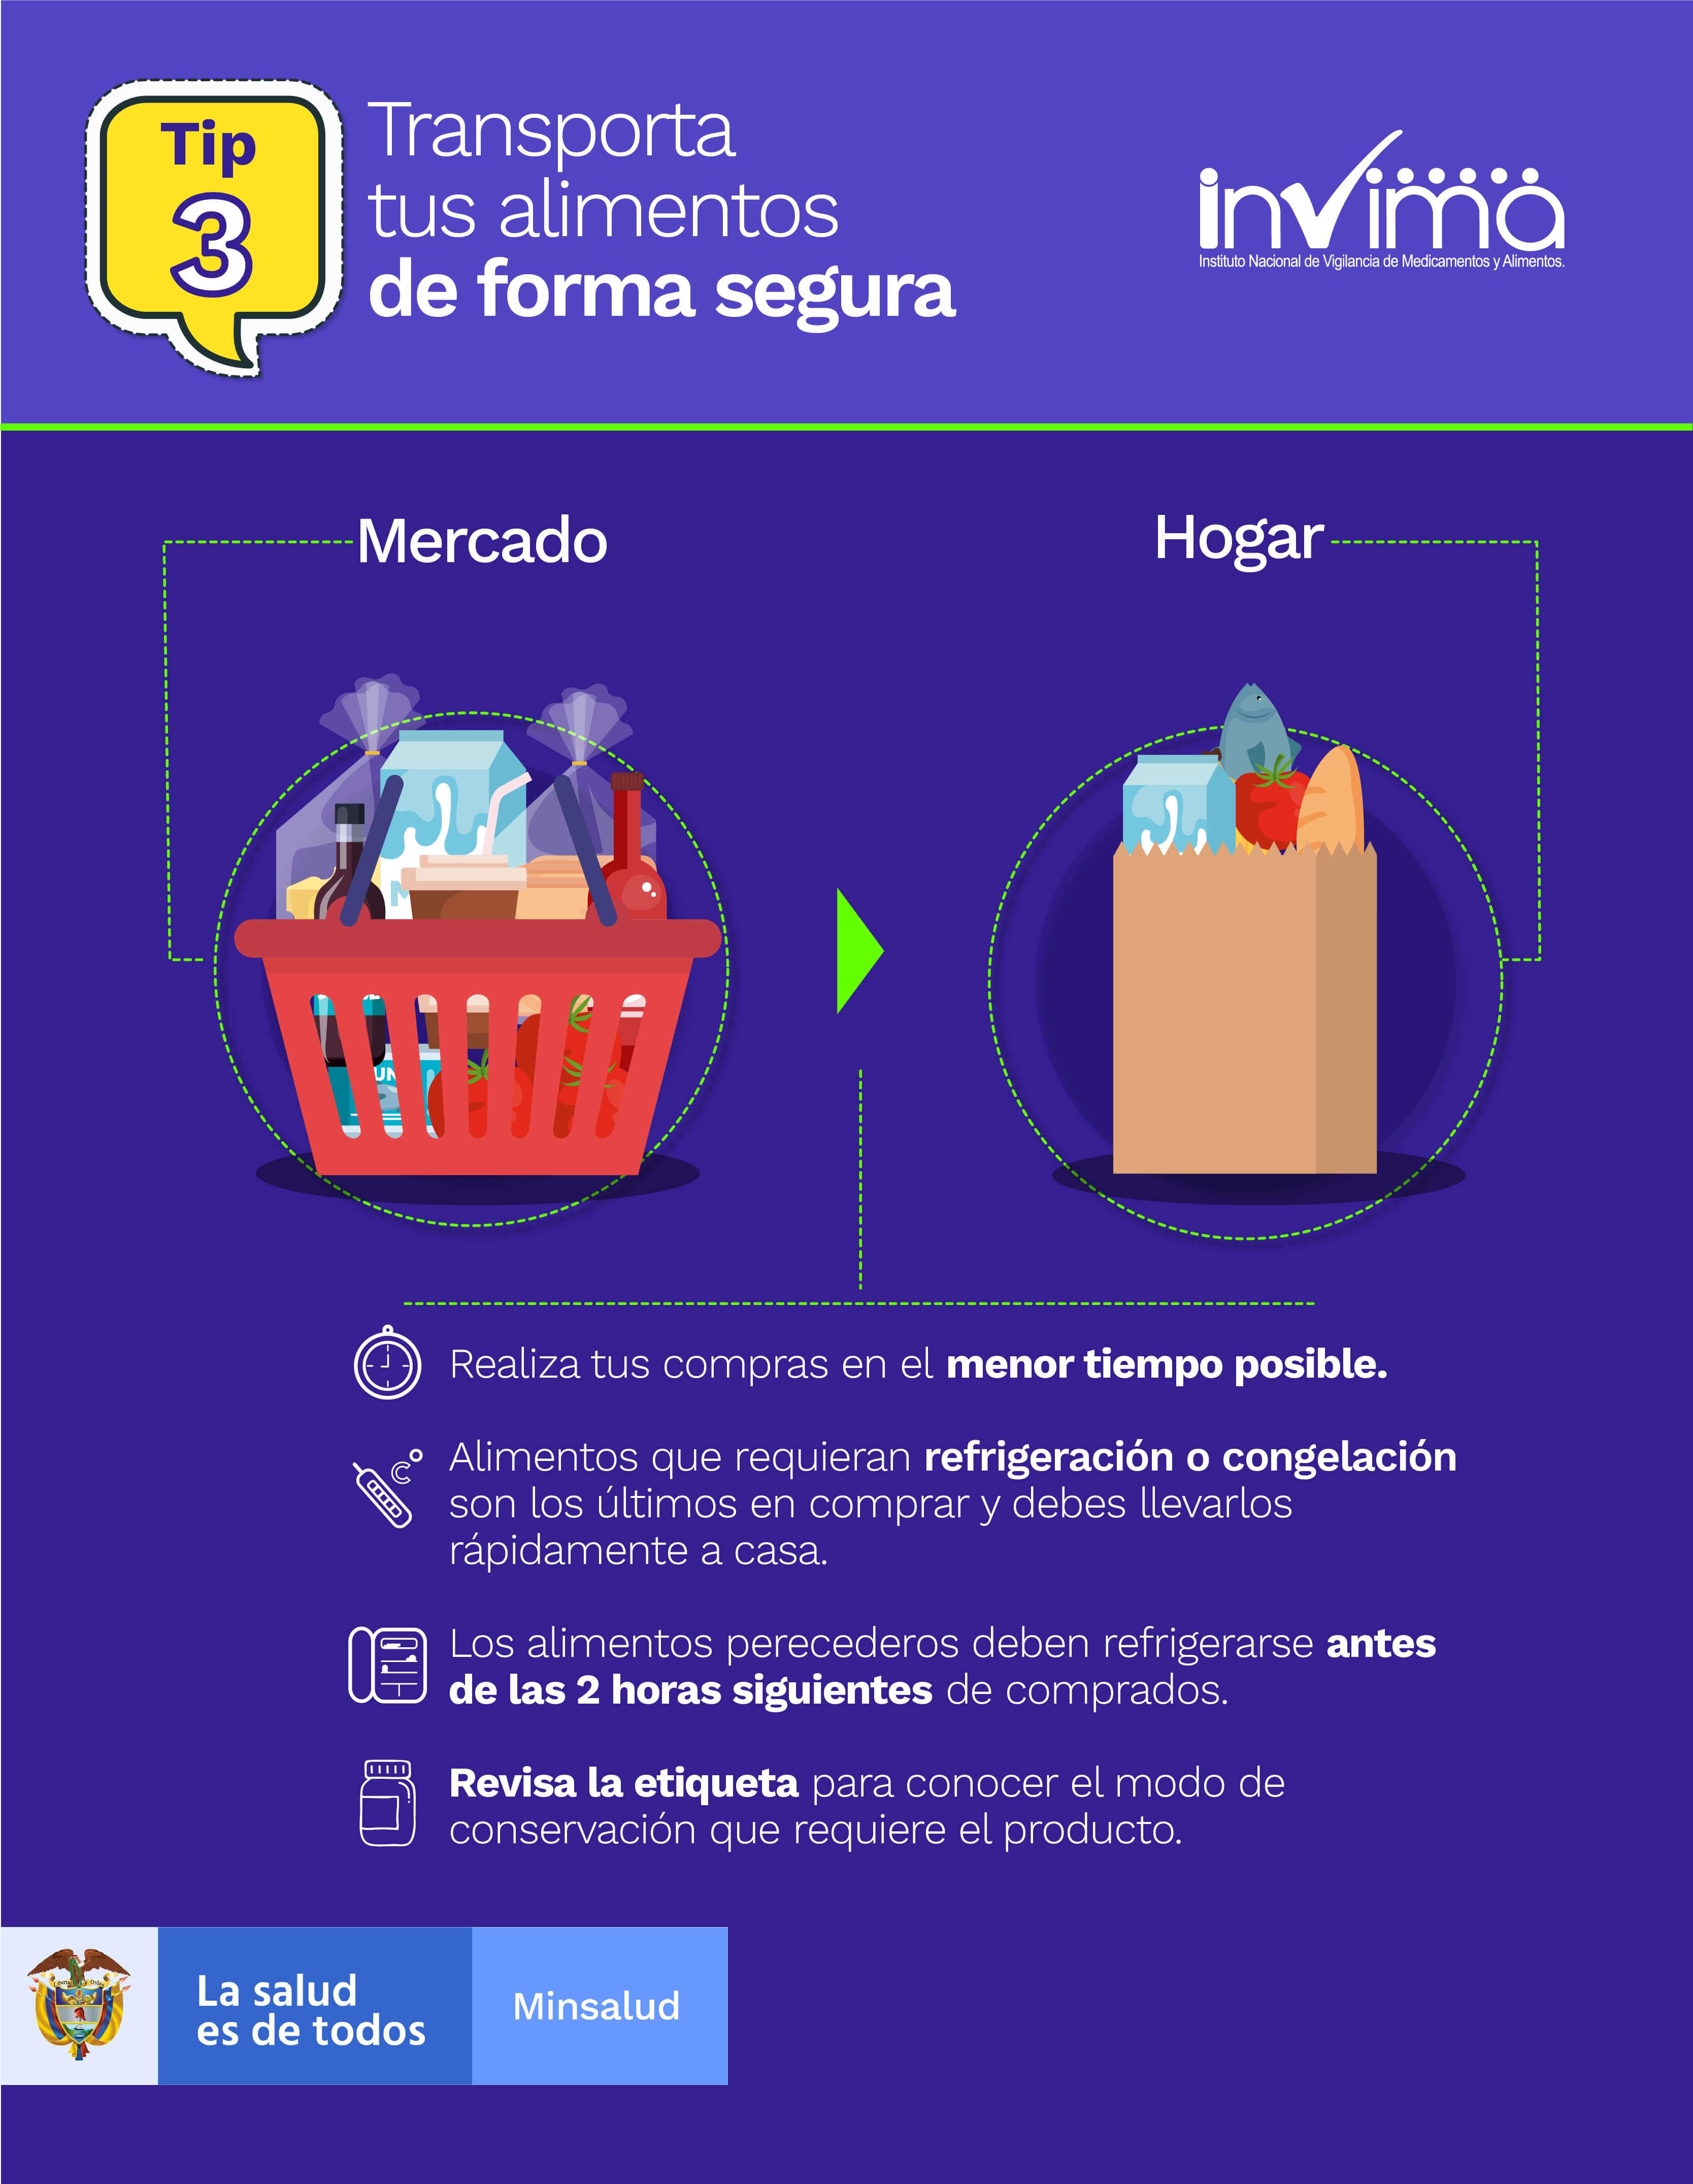 TIP 3 - Transporta alimentos de forma segura